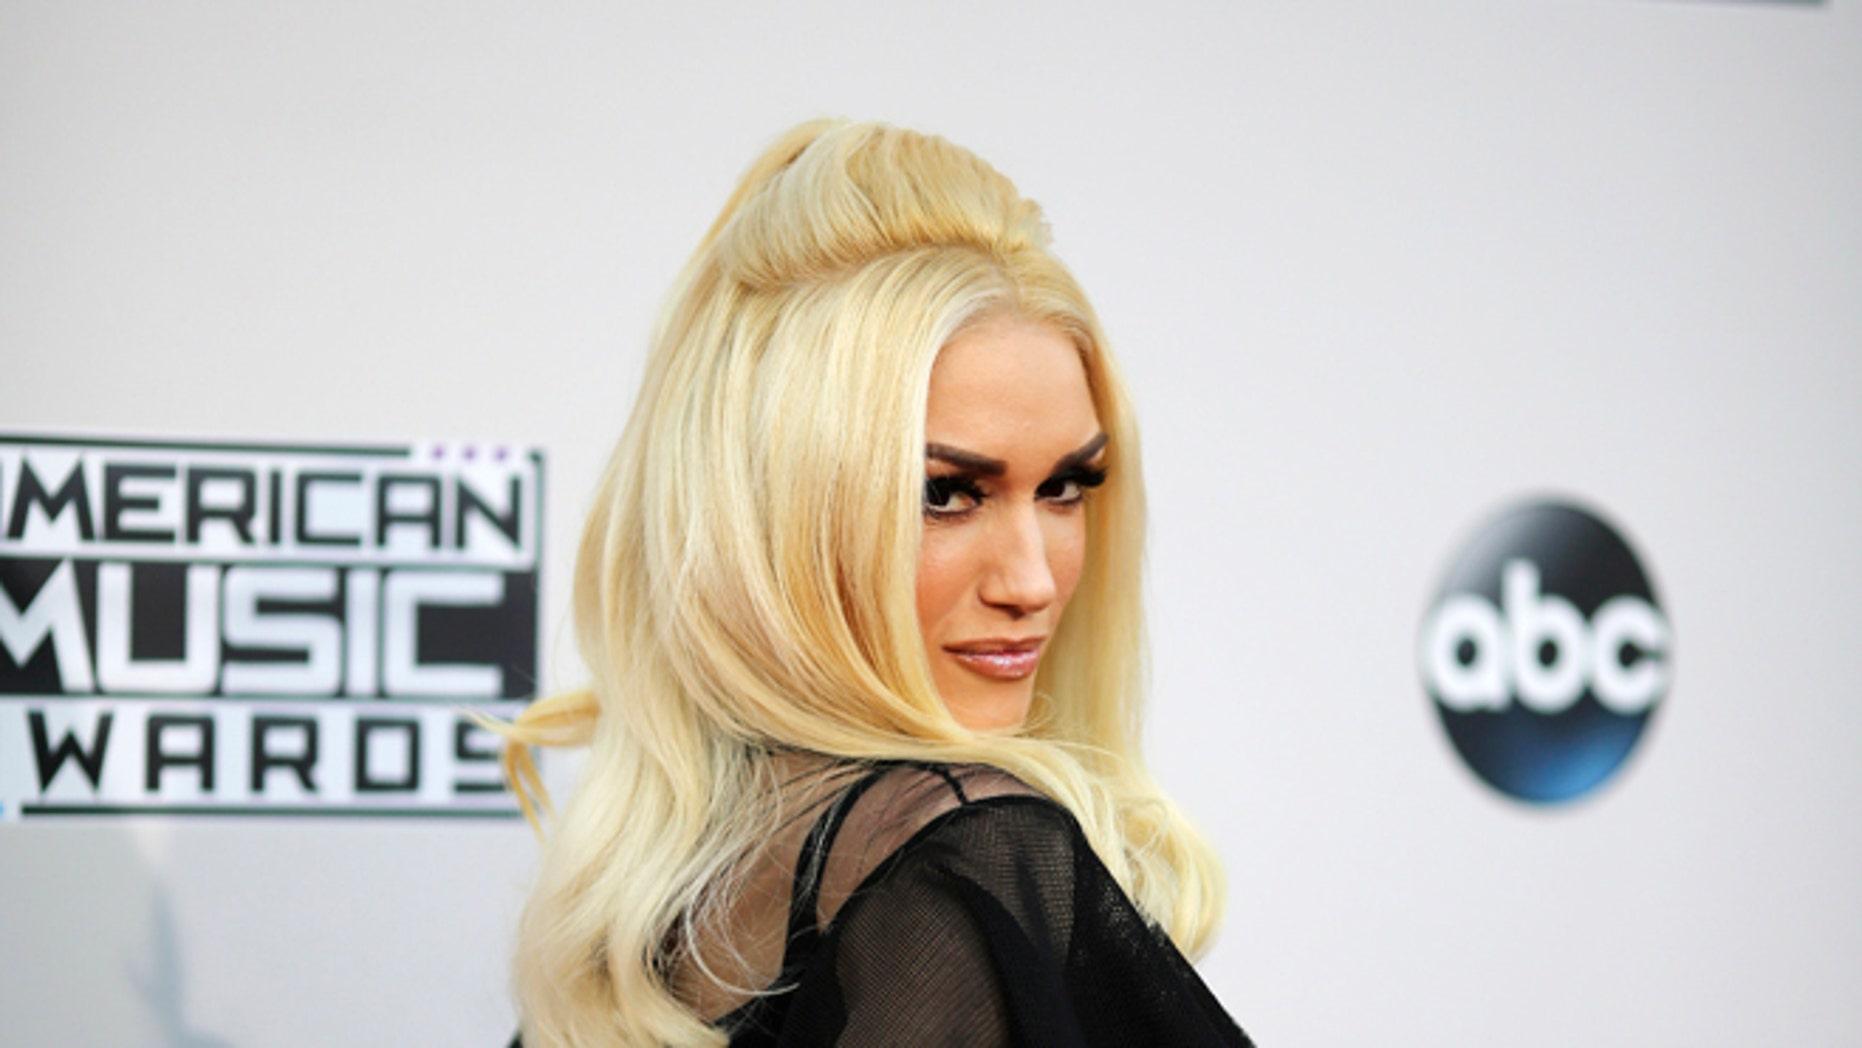 November 22, 2015. Singer Gwen Stefani arrives at the 2015 American Music Awards in Los Angeles, California.